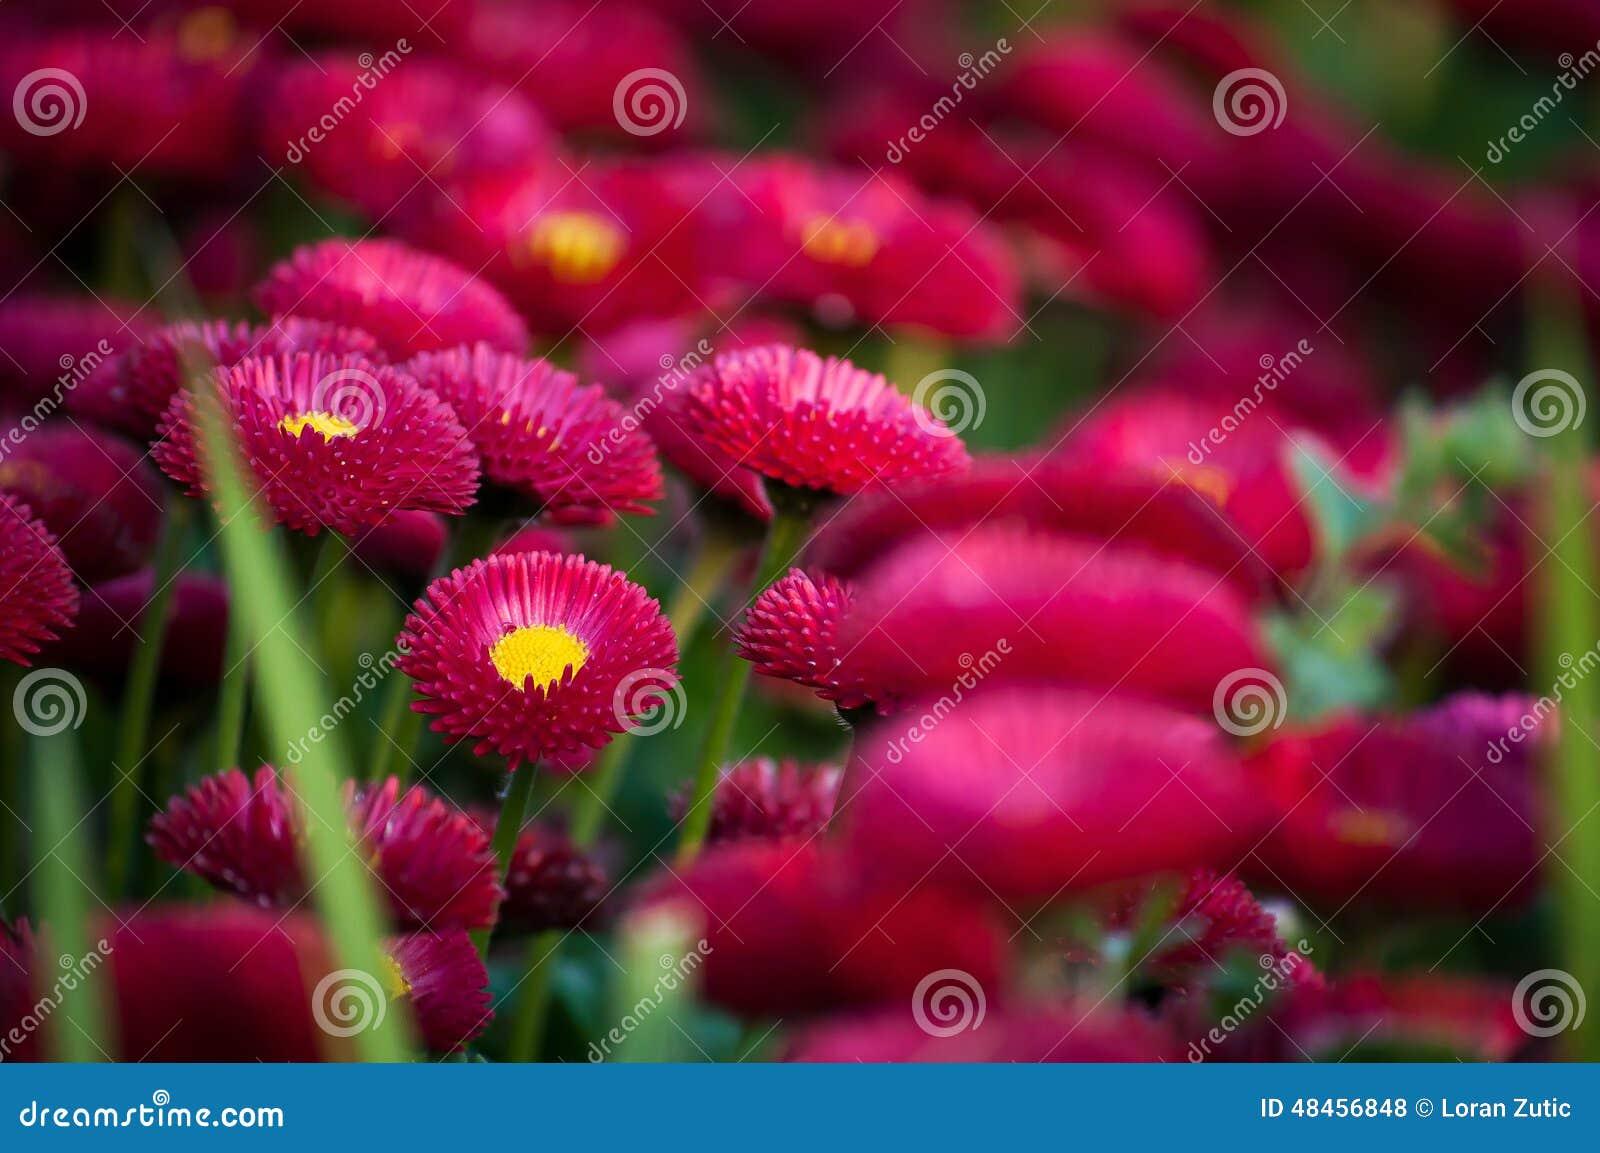 Flowers color fuchsia stock photo. Image of belgrade - 48456848